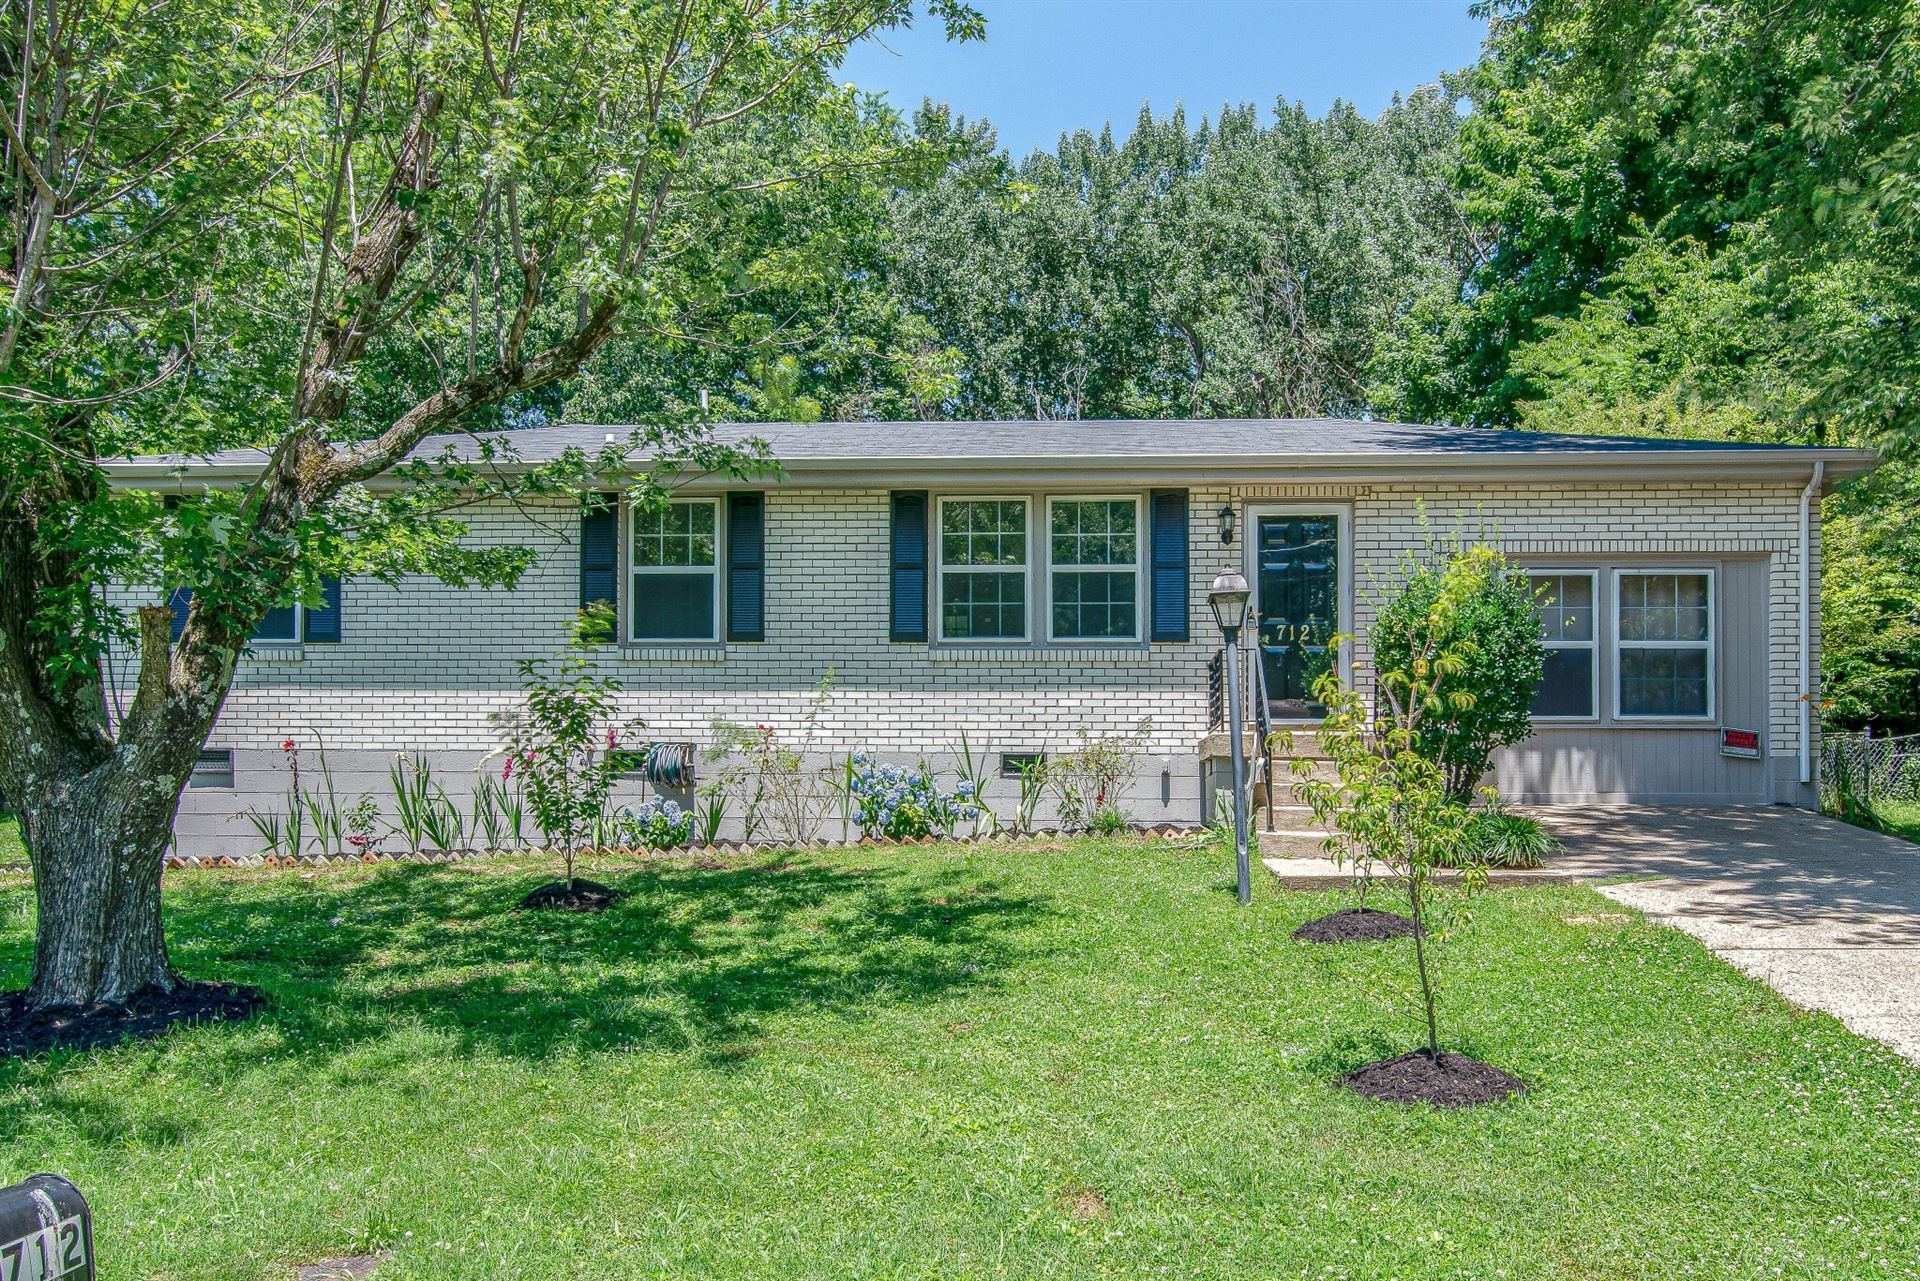 712 Bowfield Ct, Antioch, TN 37013 - MLS#: 2263952